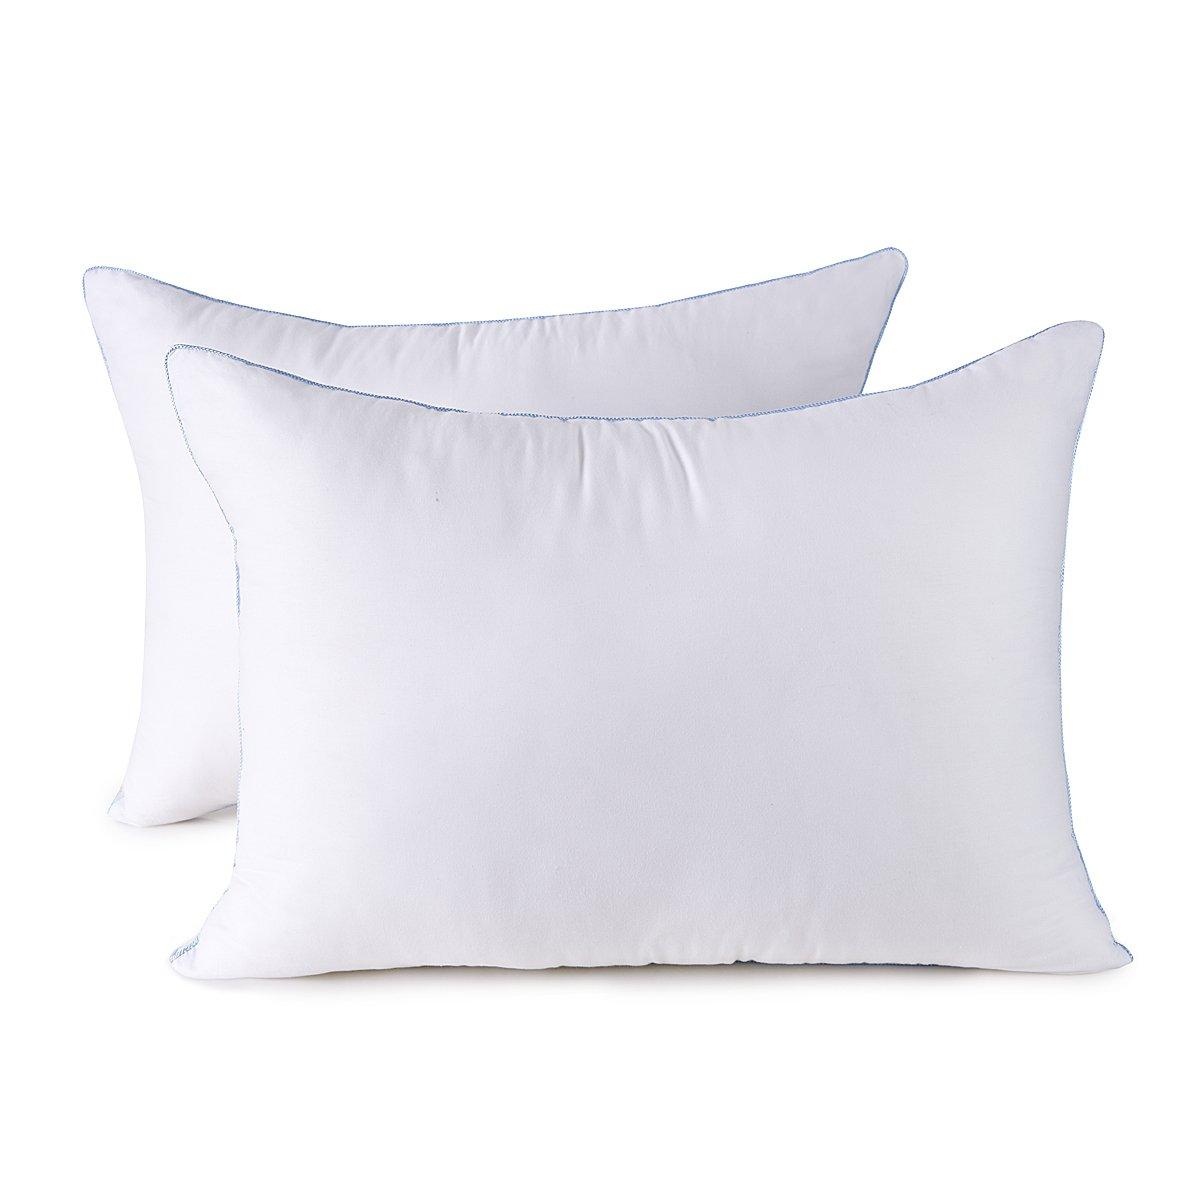 HOMESJUN Set of Two, Fluffy Down Alternative Bed Pillow Hypo-Allergenic 100% Cotton, White, 20x36